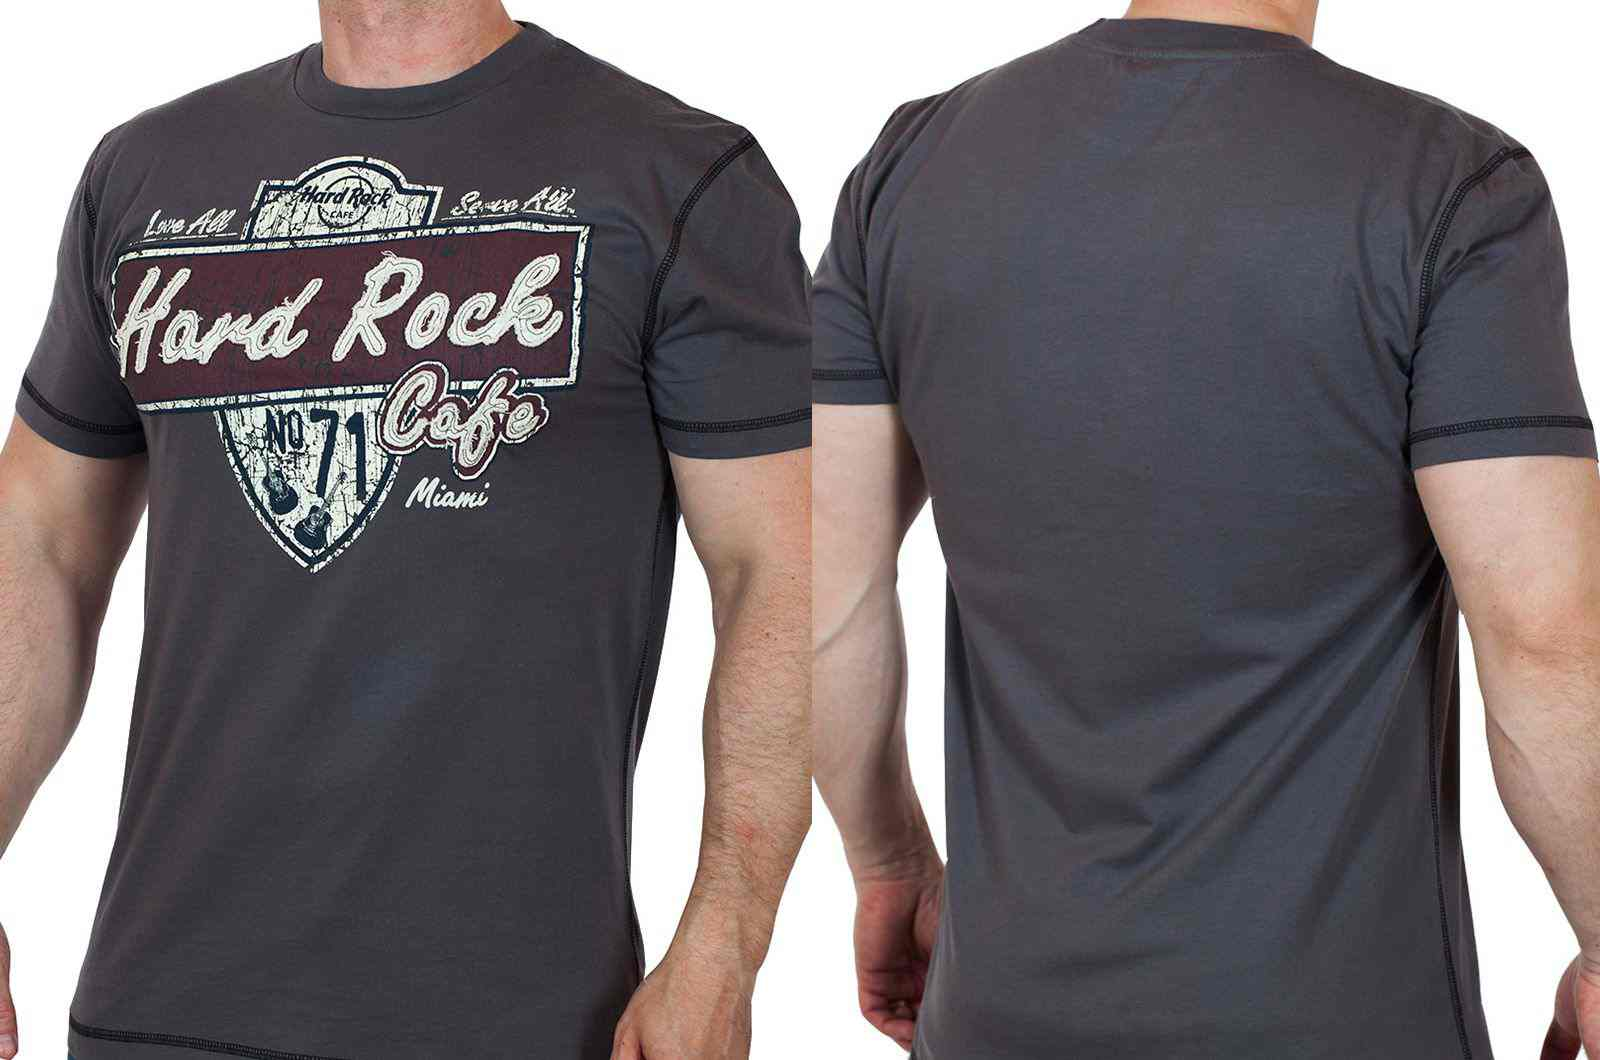 Стильная мужская футболка Hard Rock® Miami-двойная